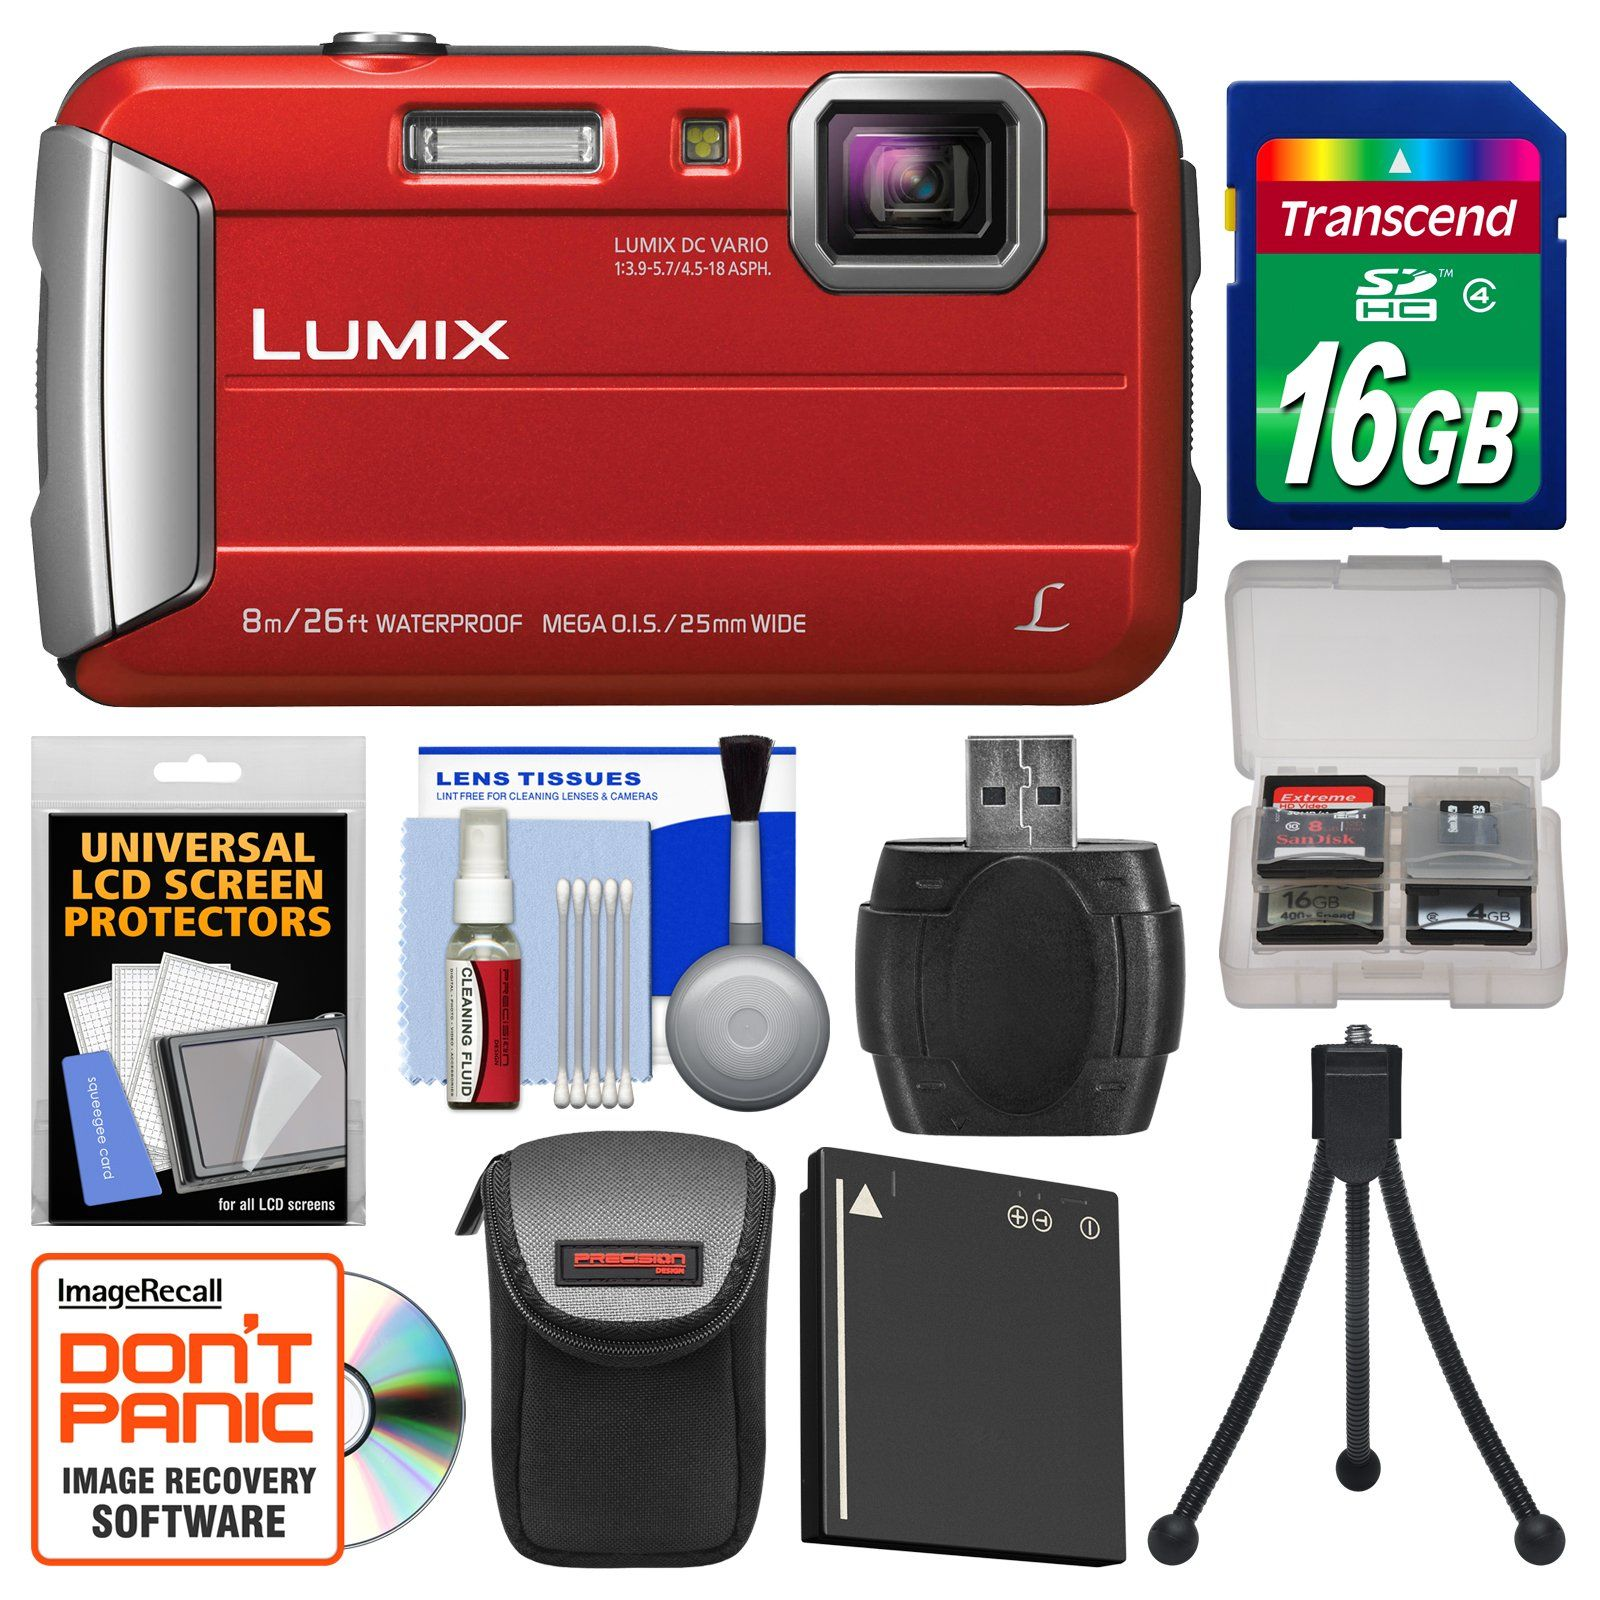 Panasonic Lumix Dmc Ts30 Tough Shock Waterproof Digital Camera Red With 16gb Card Case Waterproof Digital Camera Best Waterproof Camera Digital Camera